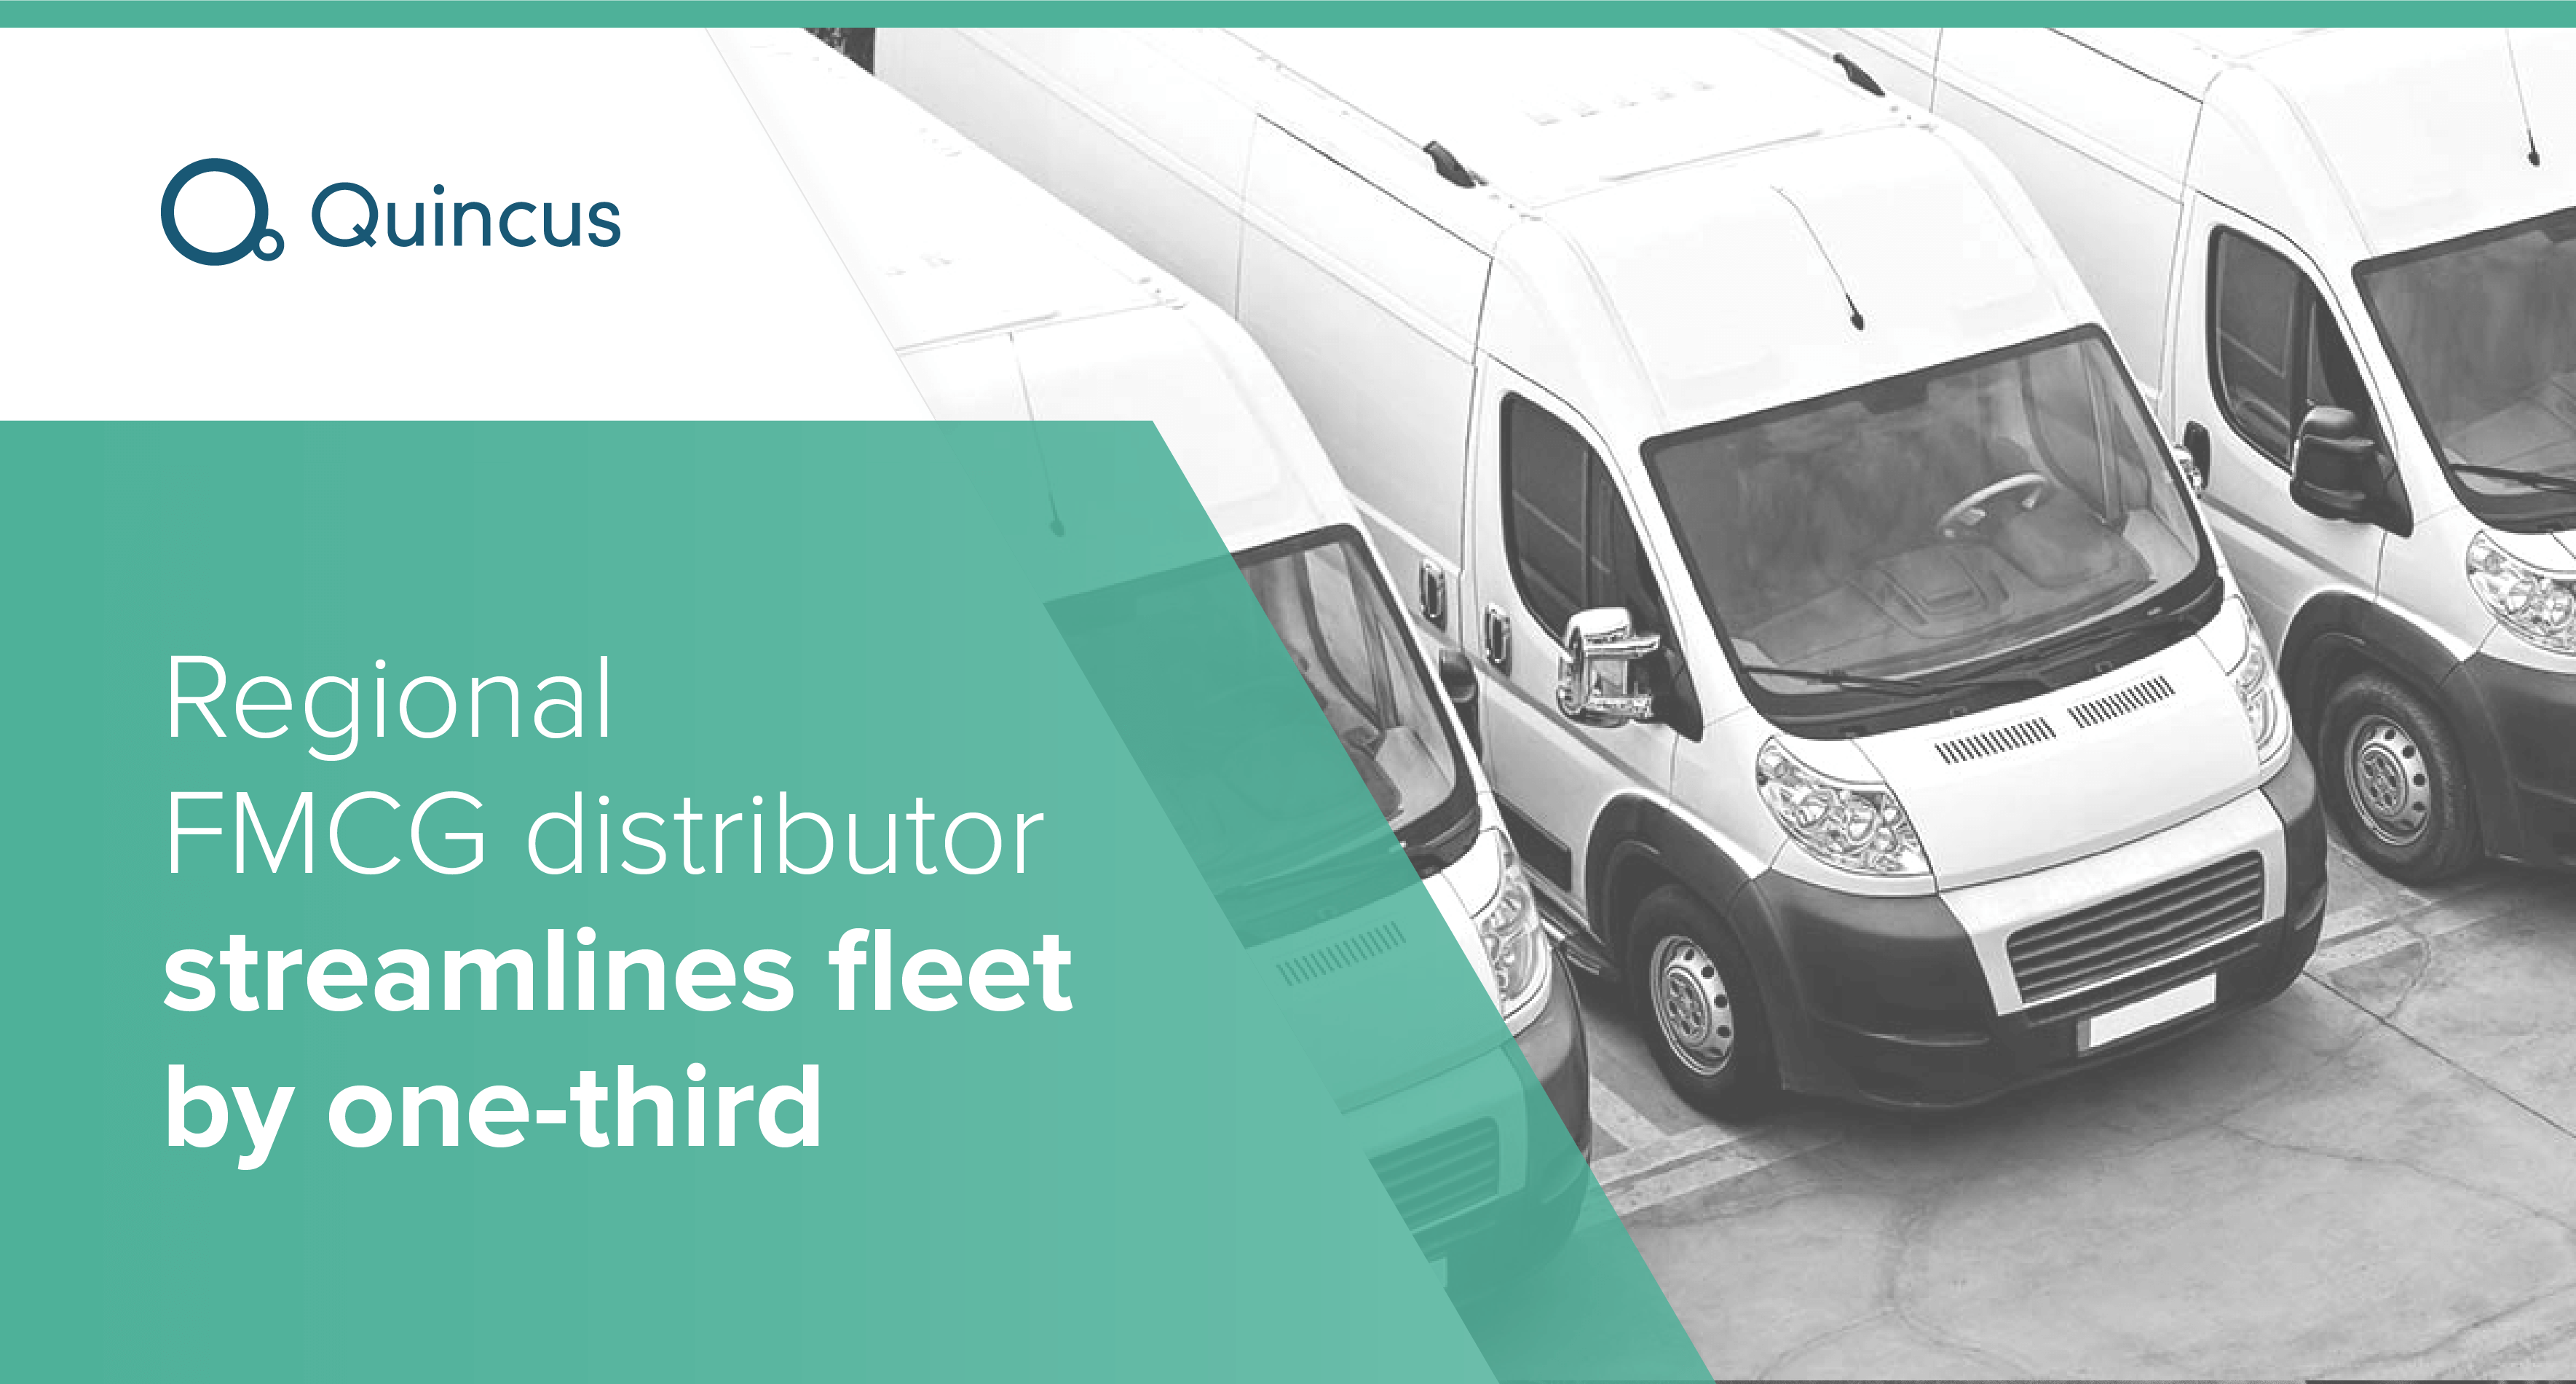 Regional FMCG distributor streamlines fleet by one-third